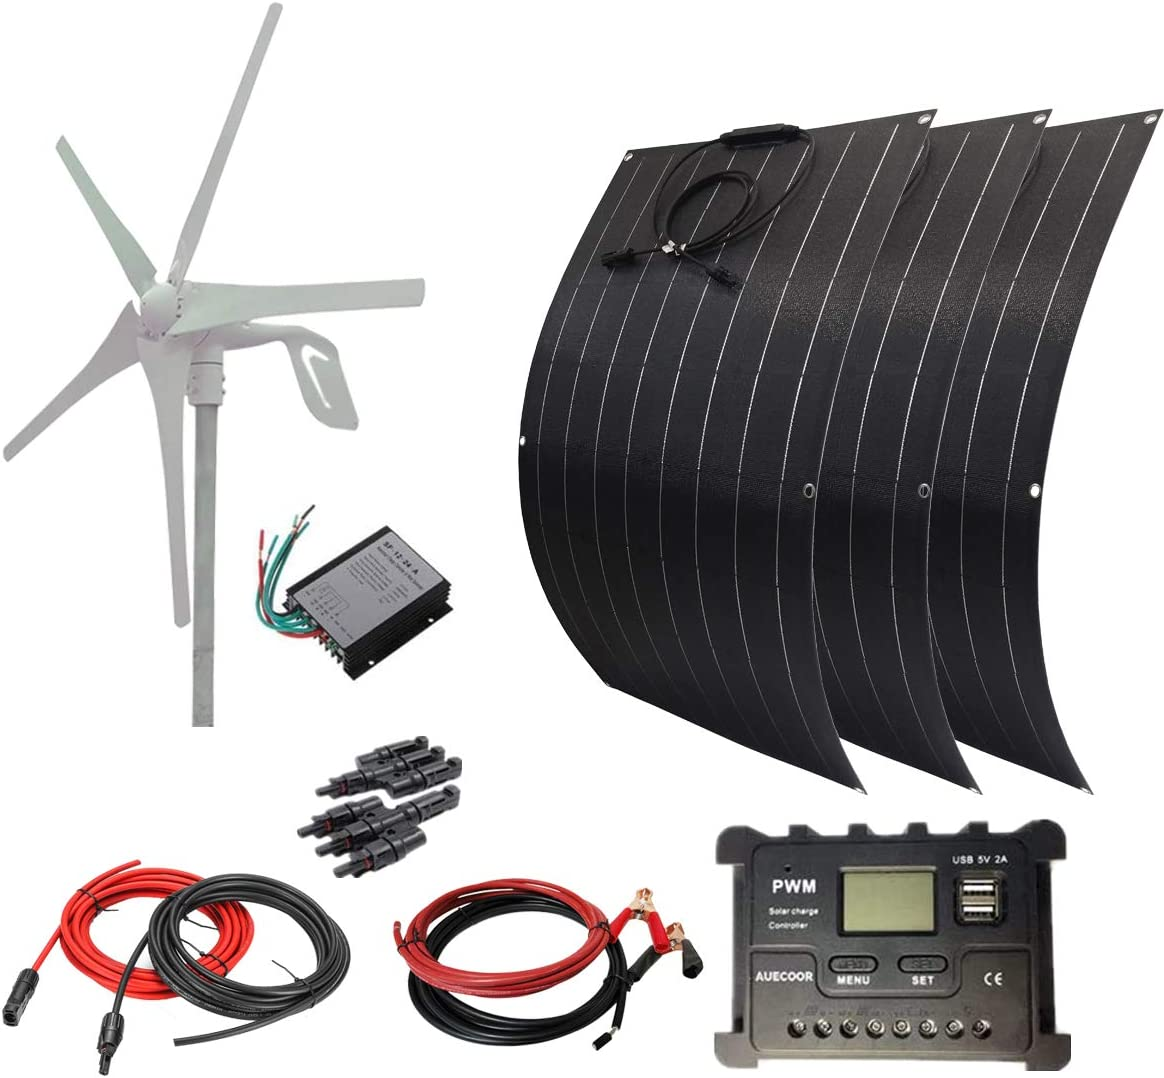 AUECOOR 700W Solar Wind Power Kit: 300W Flexible Monocrystalline Solar Panel + 400W 12V Wind Turbine Generator + Accessories for Home, Boat, Farm, Off Grid Application